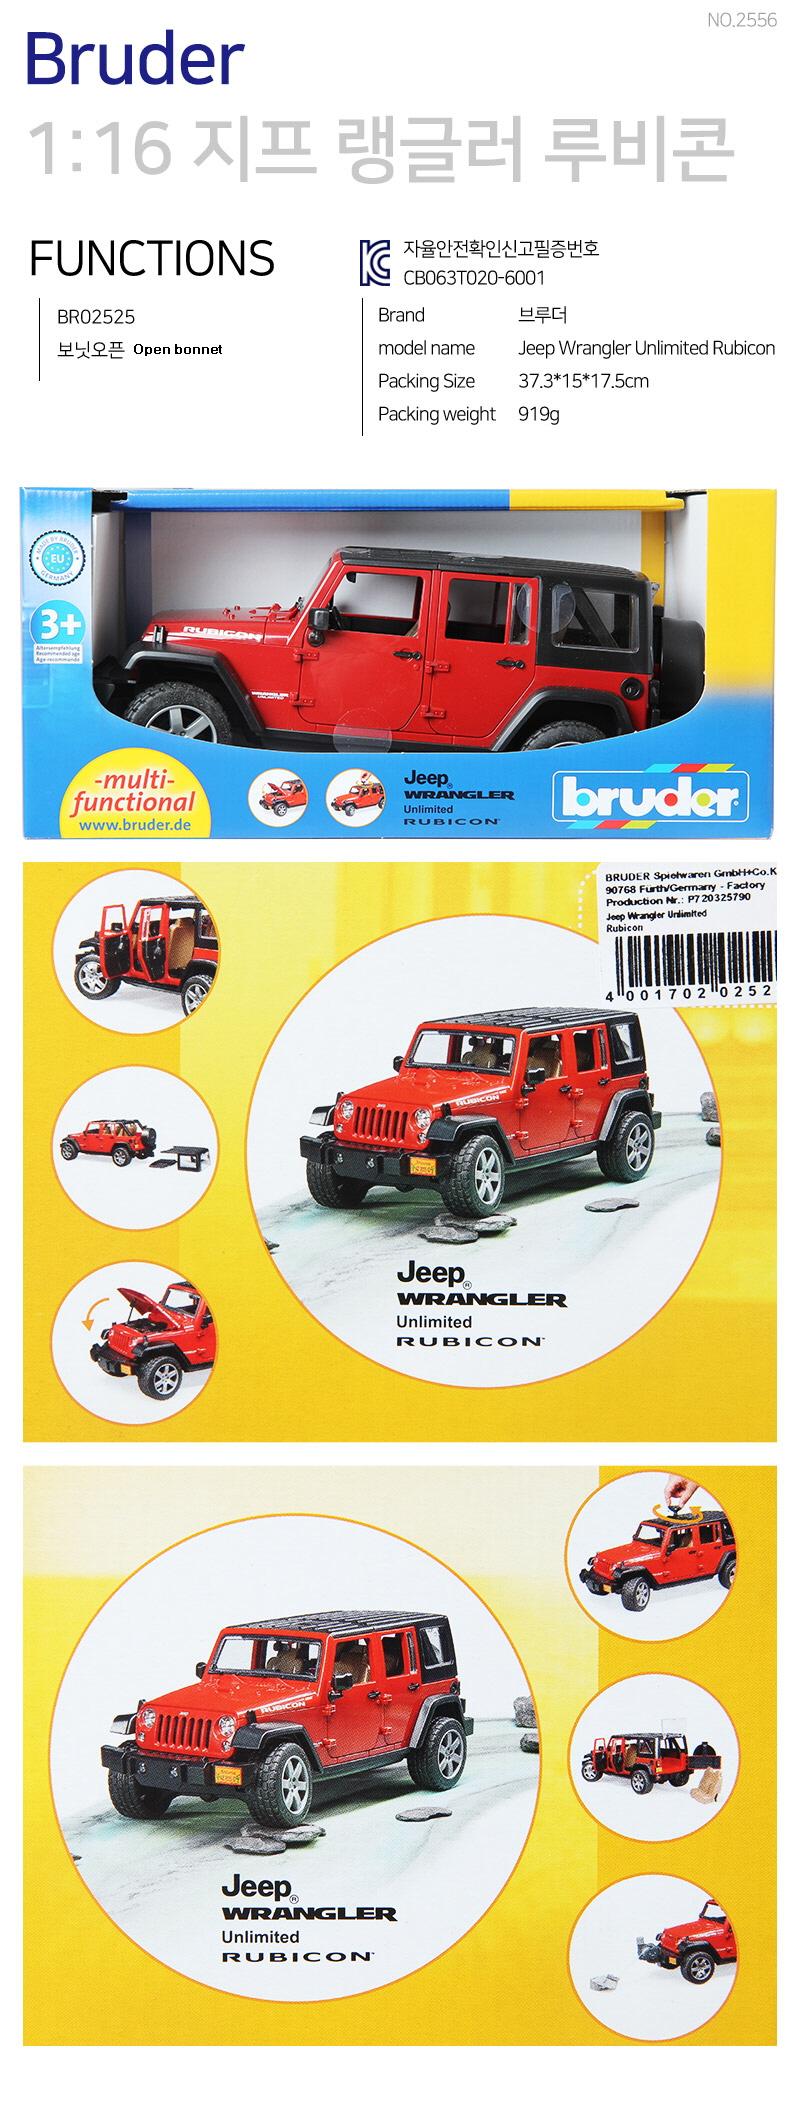 Nabita World Bruder 1 16 Jeep Wrangler Unlimited Rubicon Red Br02525 Car Toy Ebay